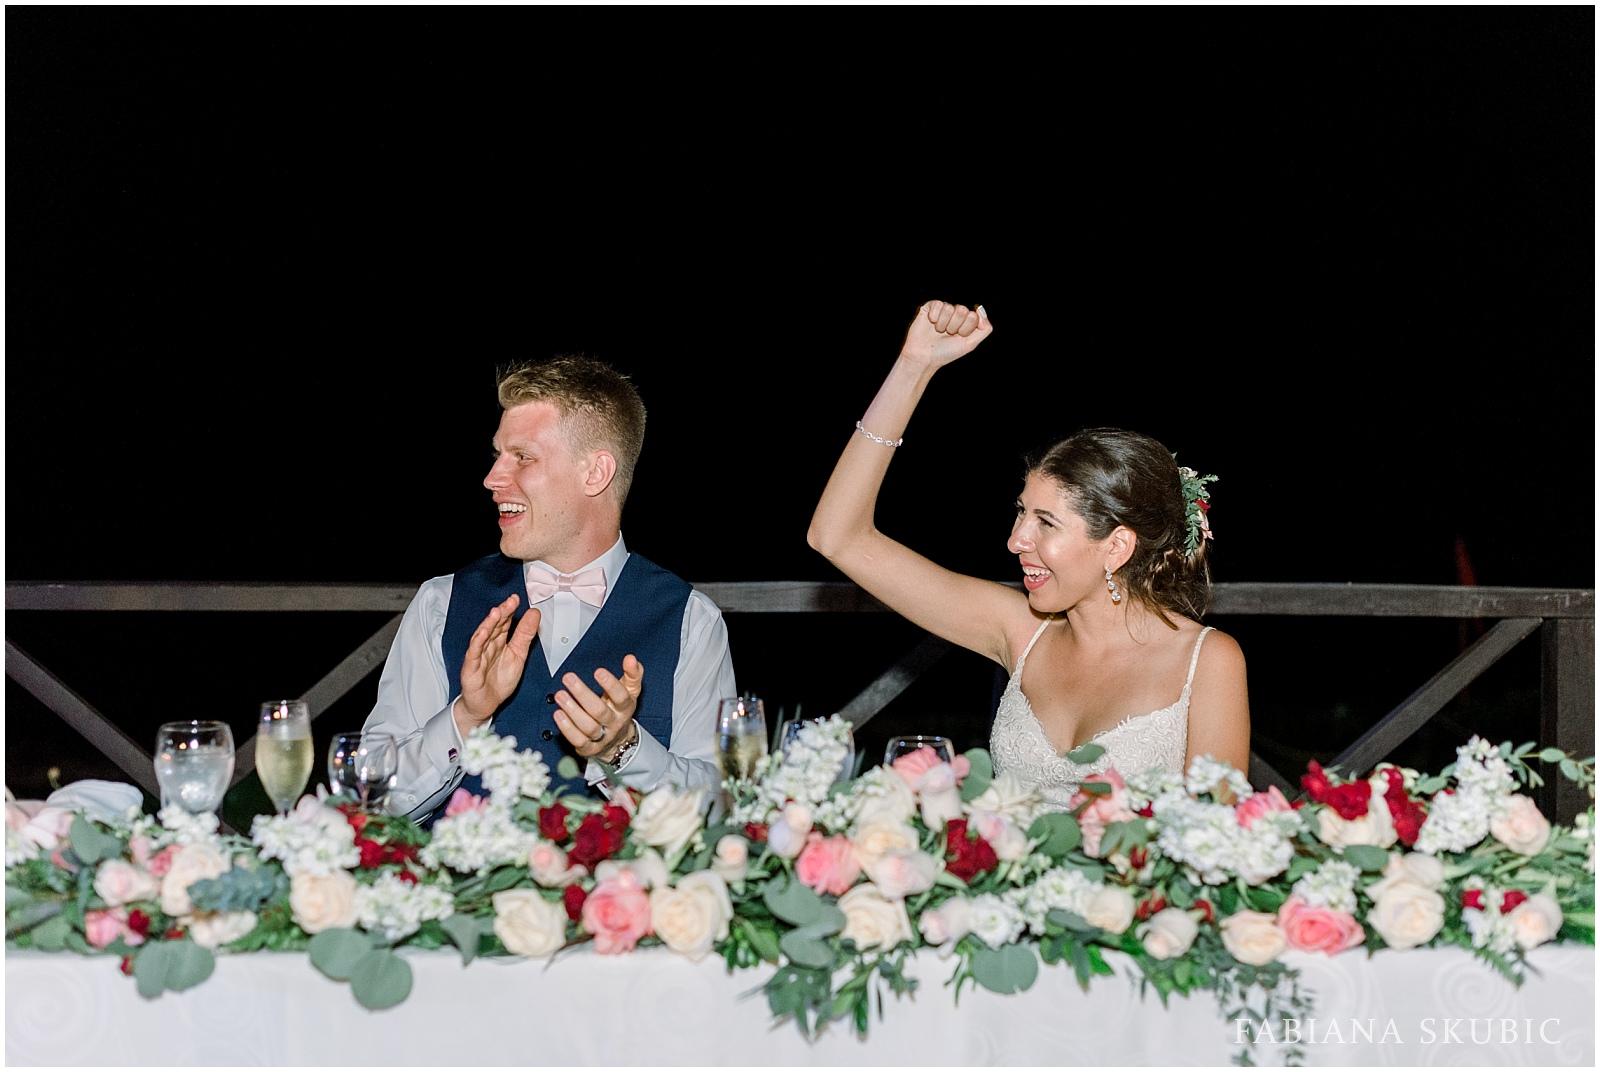 TJ_Now_Sapphire_Riviera_Cancun_Mexico_Wedding_Photos_0281.jpg